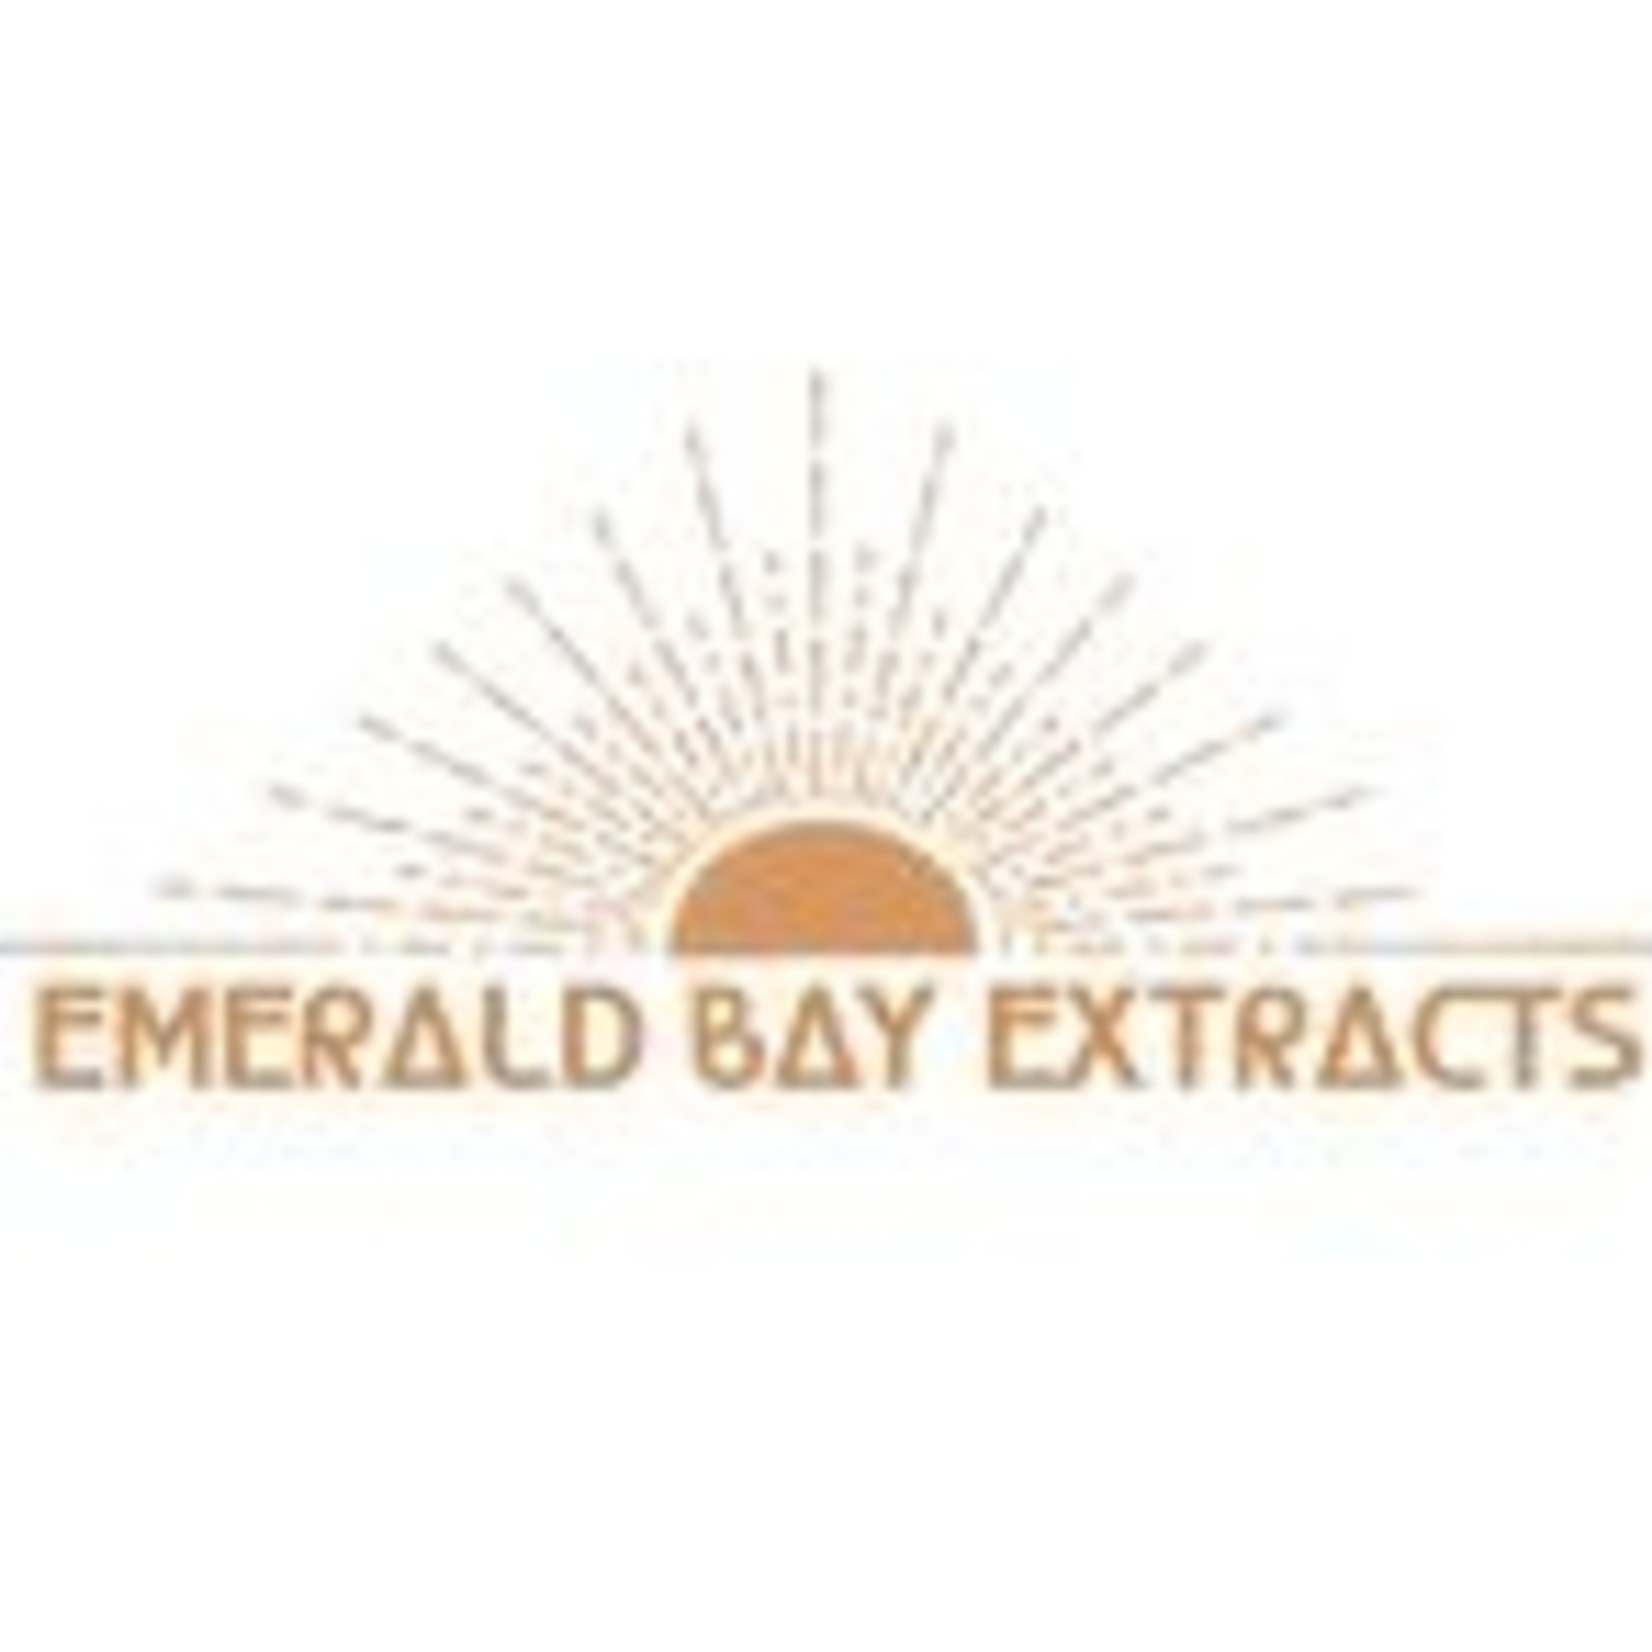 Emerald Bay Extracts / Hybrid RSO